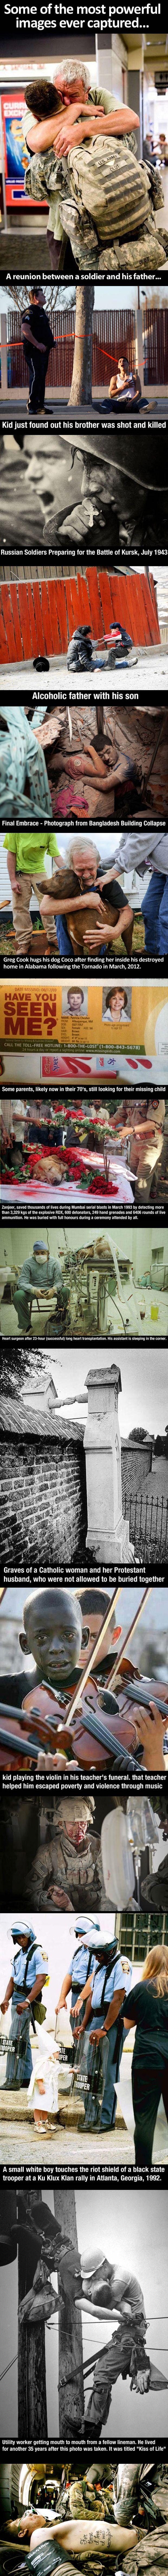 Wow. So sad but beautiful